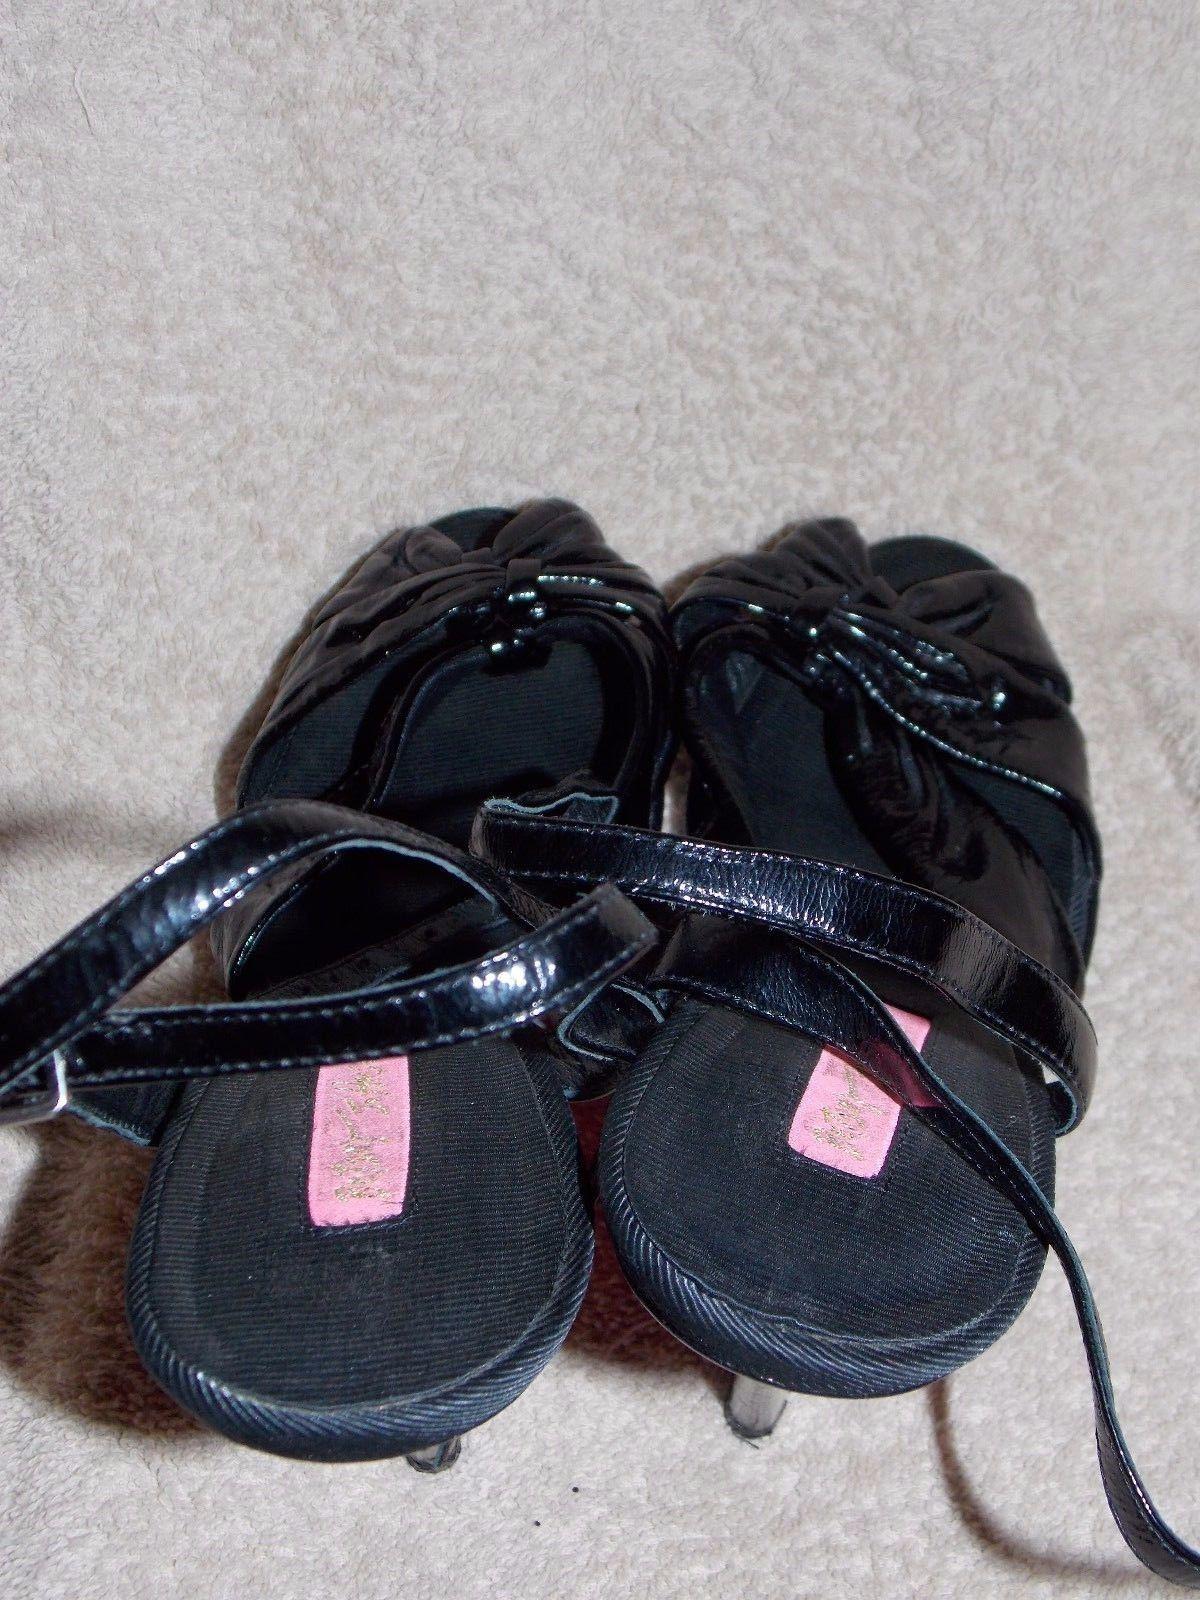 Betsy Johnson Black Patent Leather STRAPPY Black Heels 8M Women Used